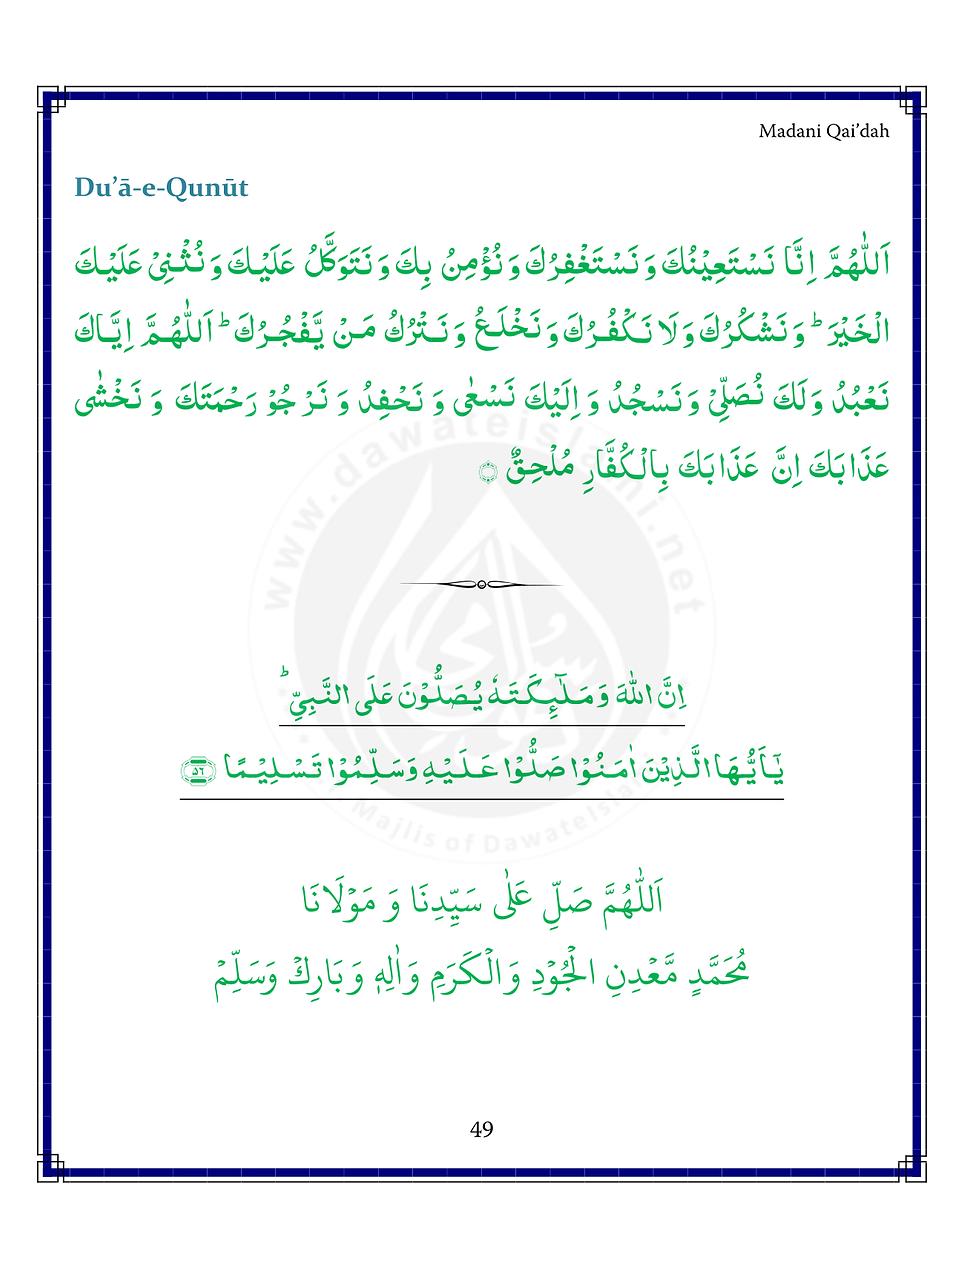 Madani Qaidah-59.png